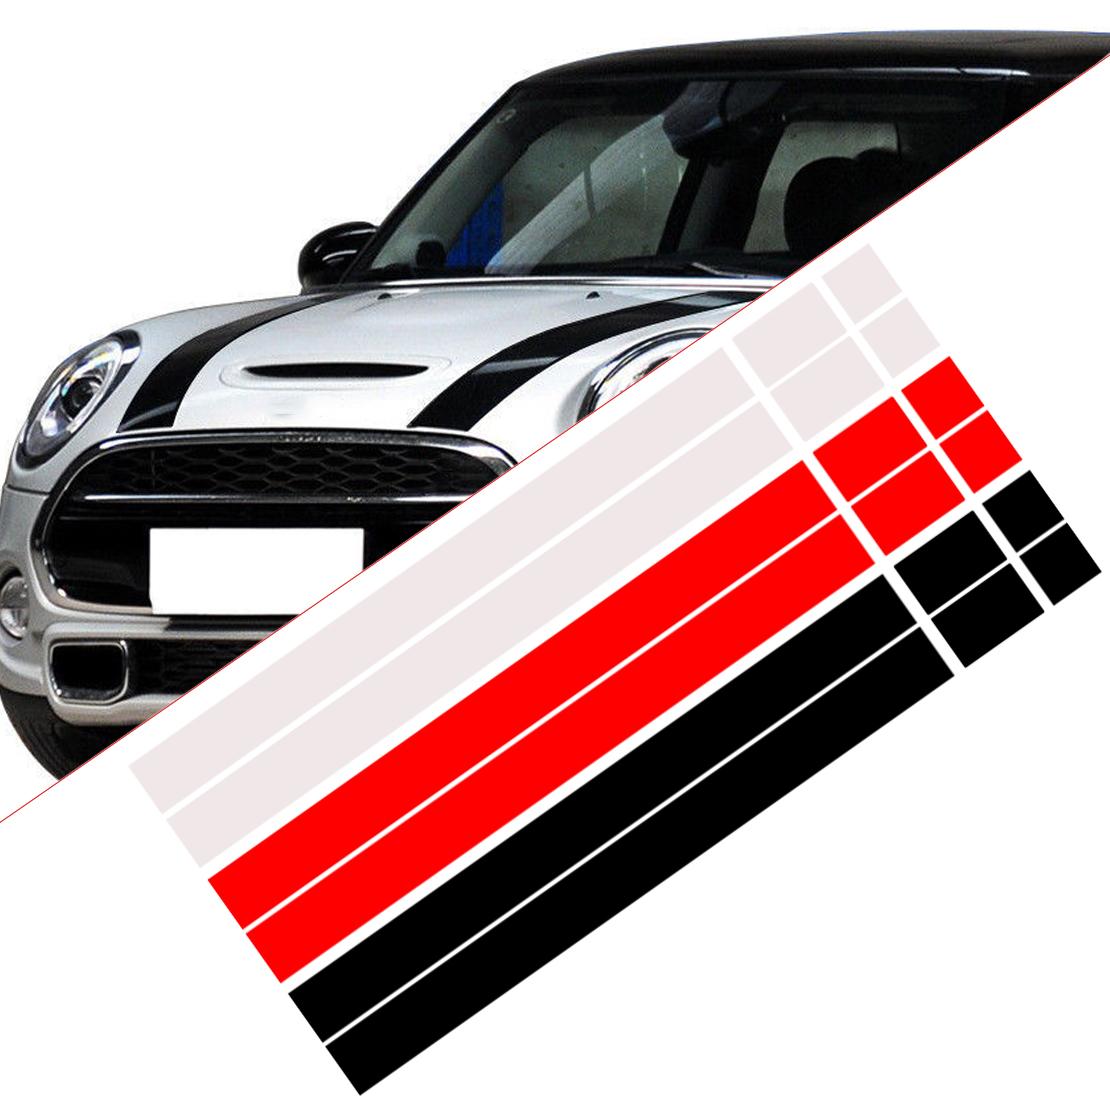 2 Bonnet Stripes Hood Decal Engine Cover Sticker for MINI Cooper R50 R53 R56 R52